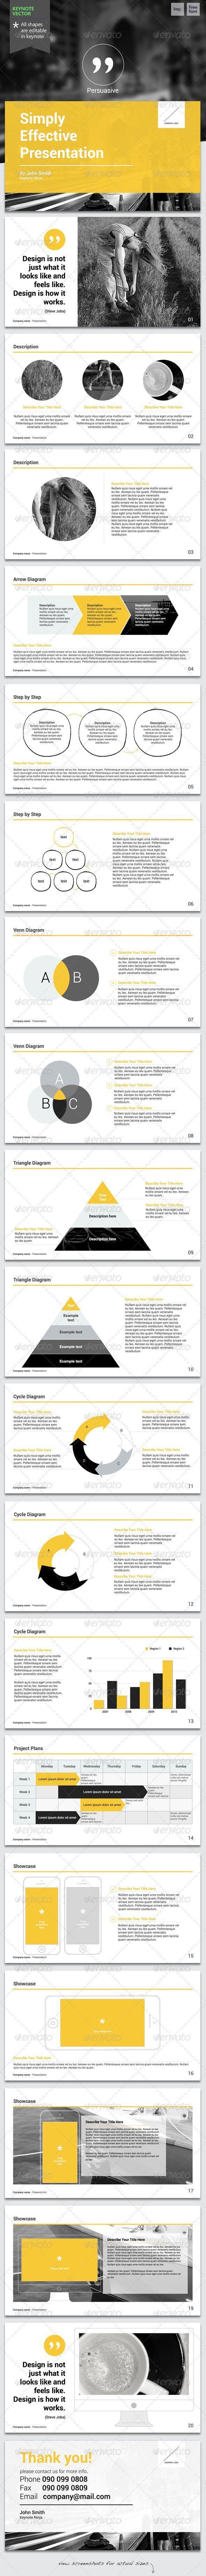 ppt presentation format